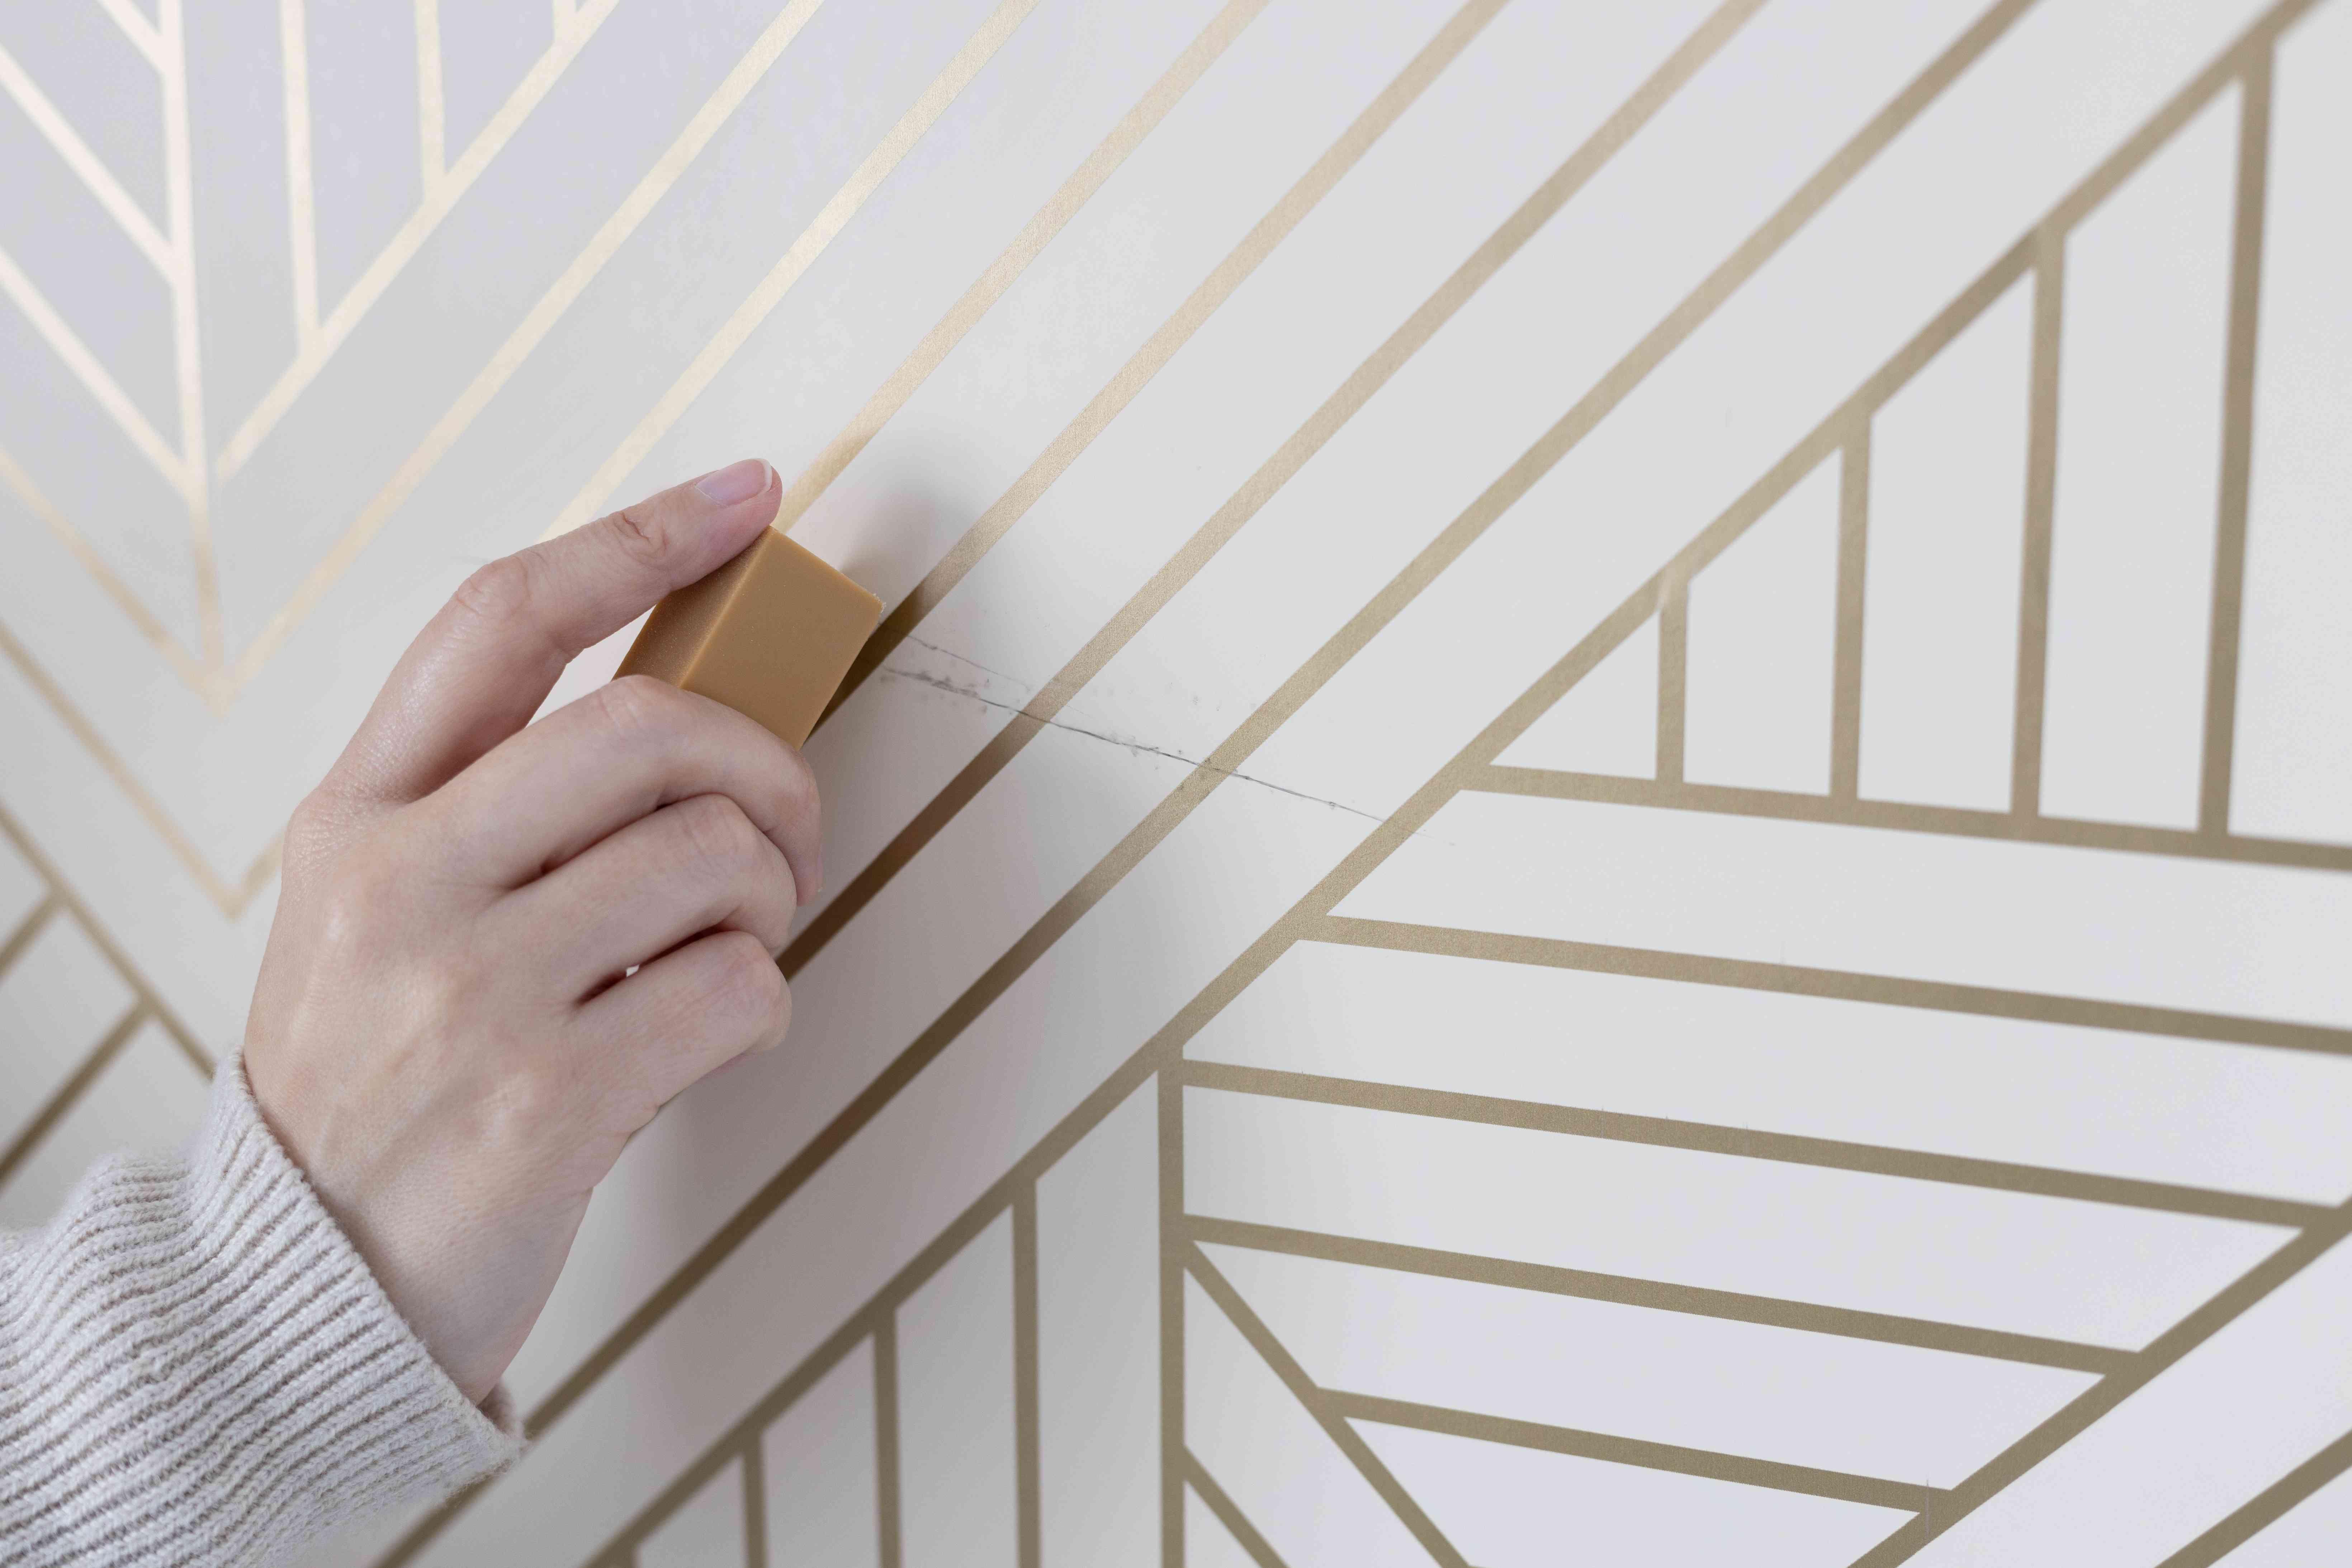 Art gum eraser removing scuff mark on white and gold striped wallpaper